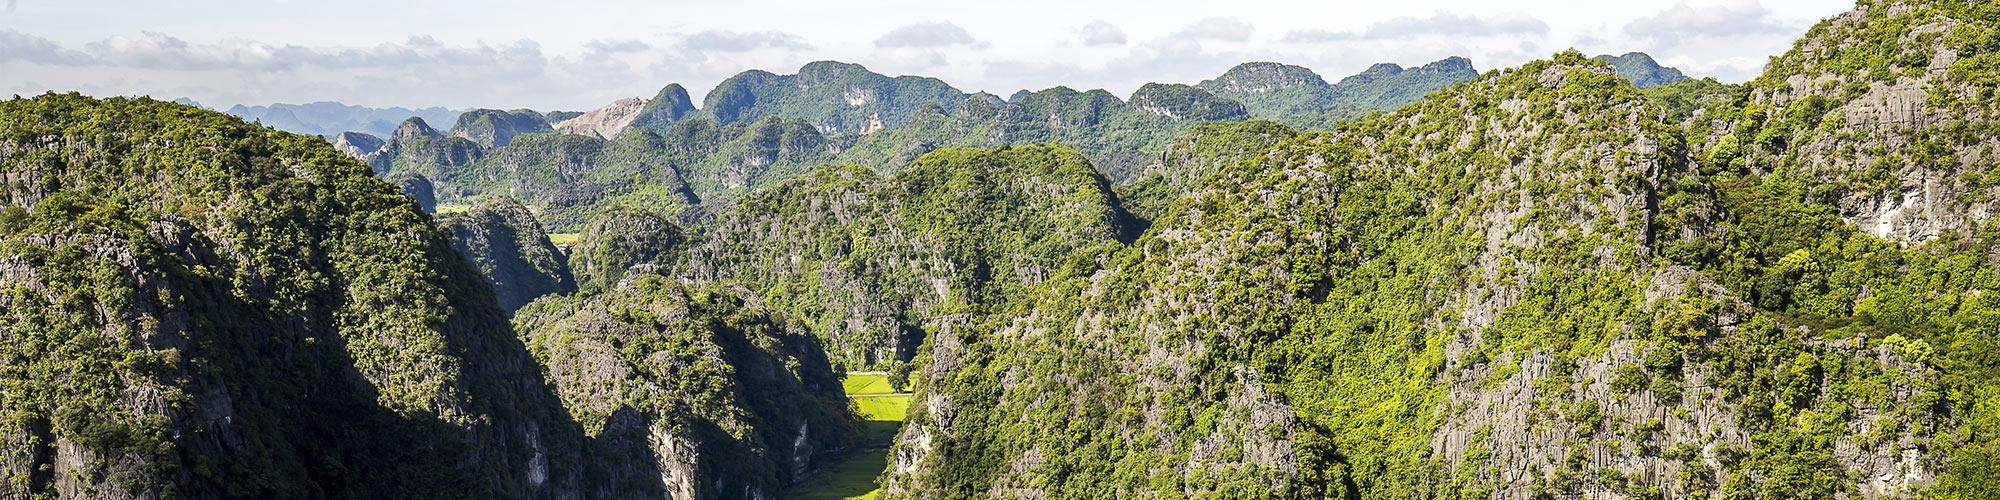 Vietnam, Ninh Binh, Rizière